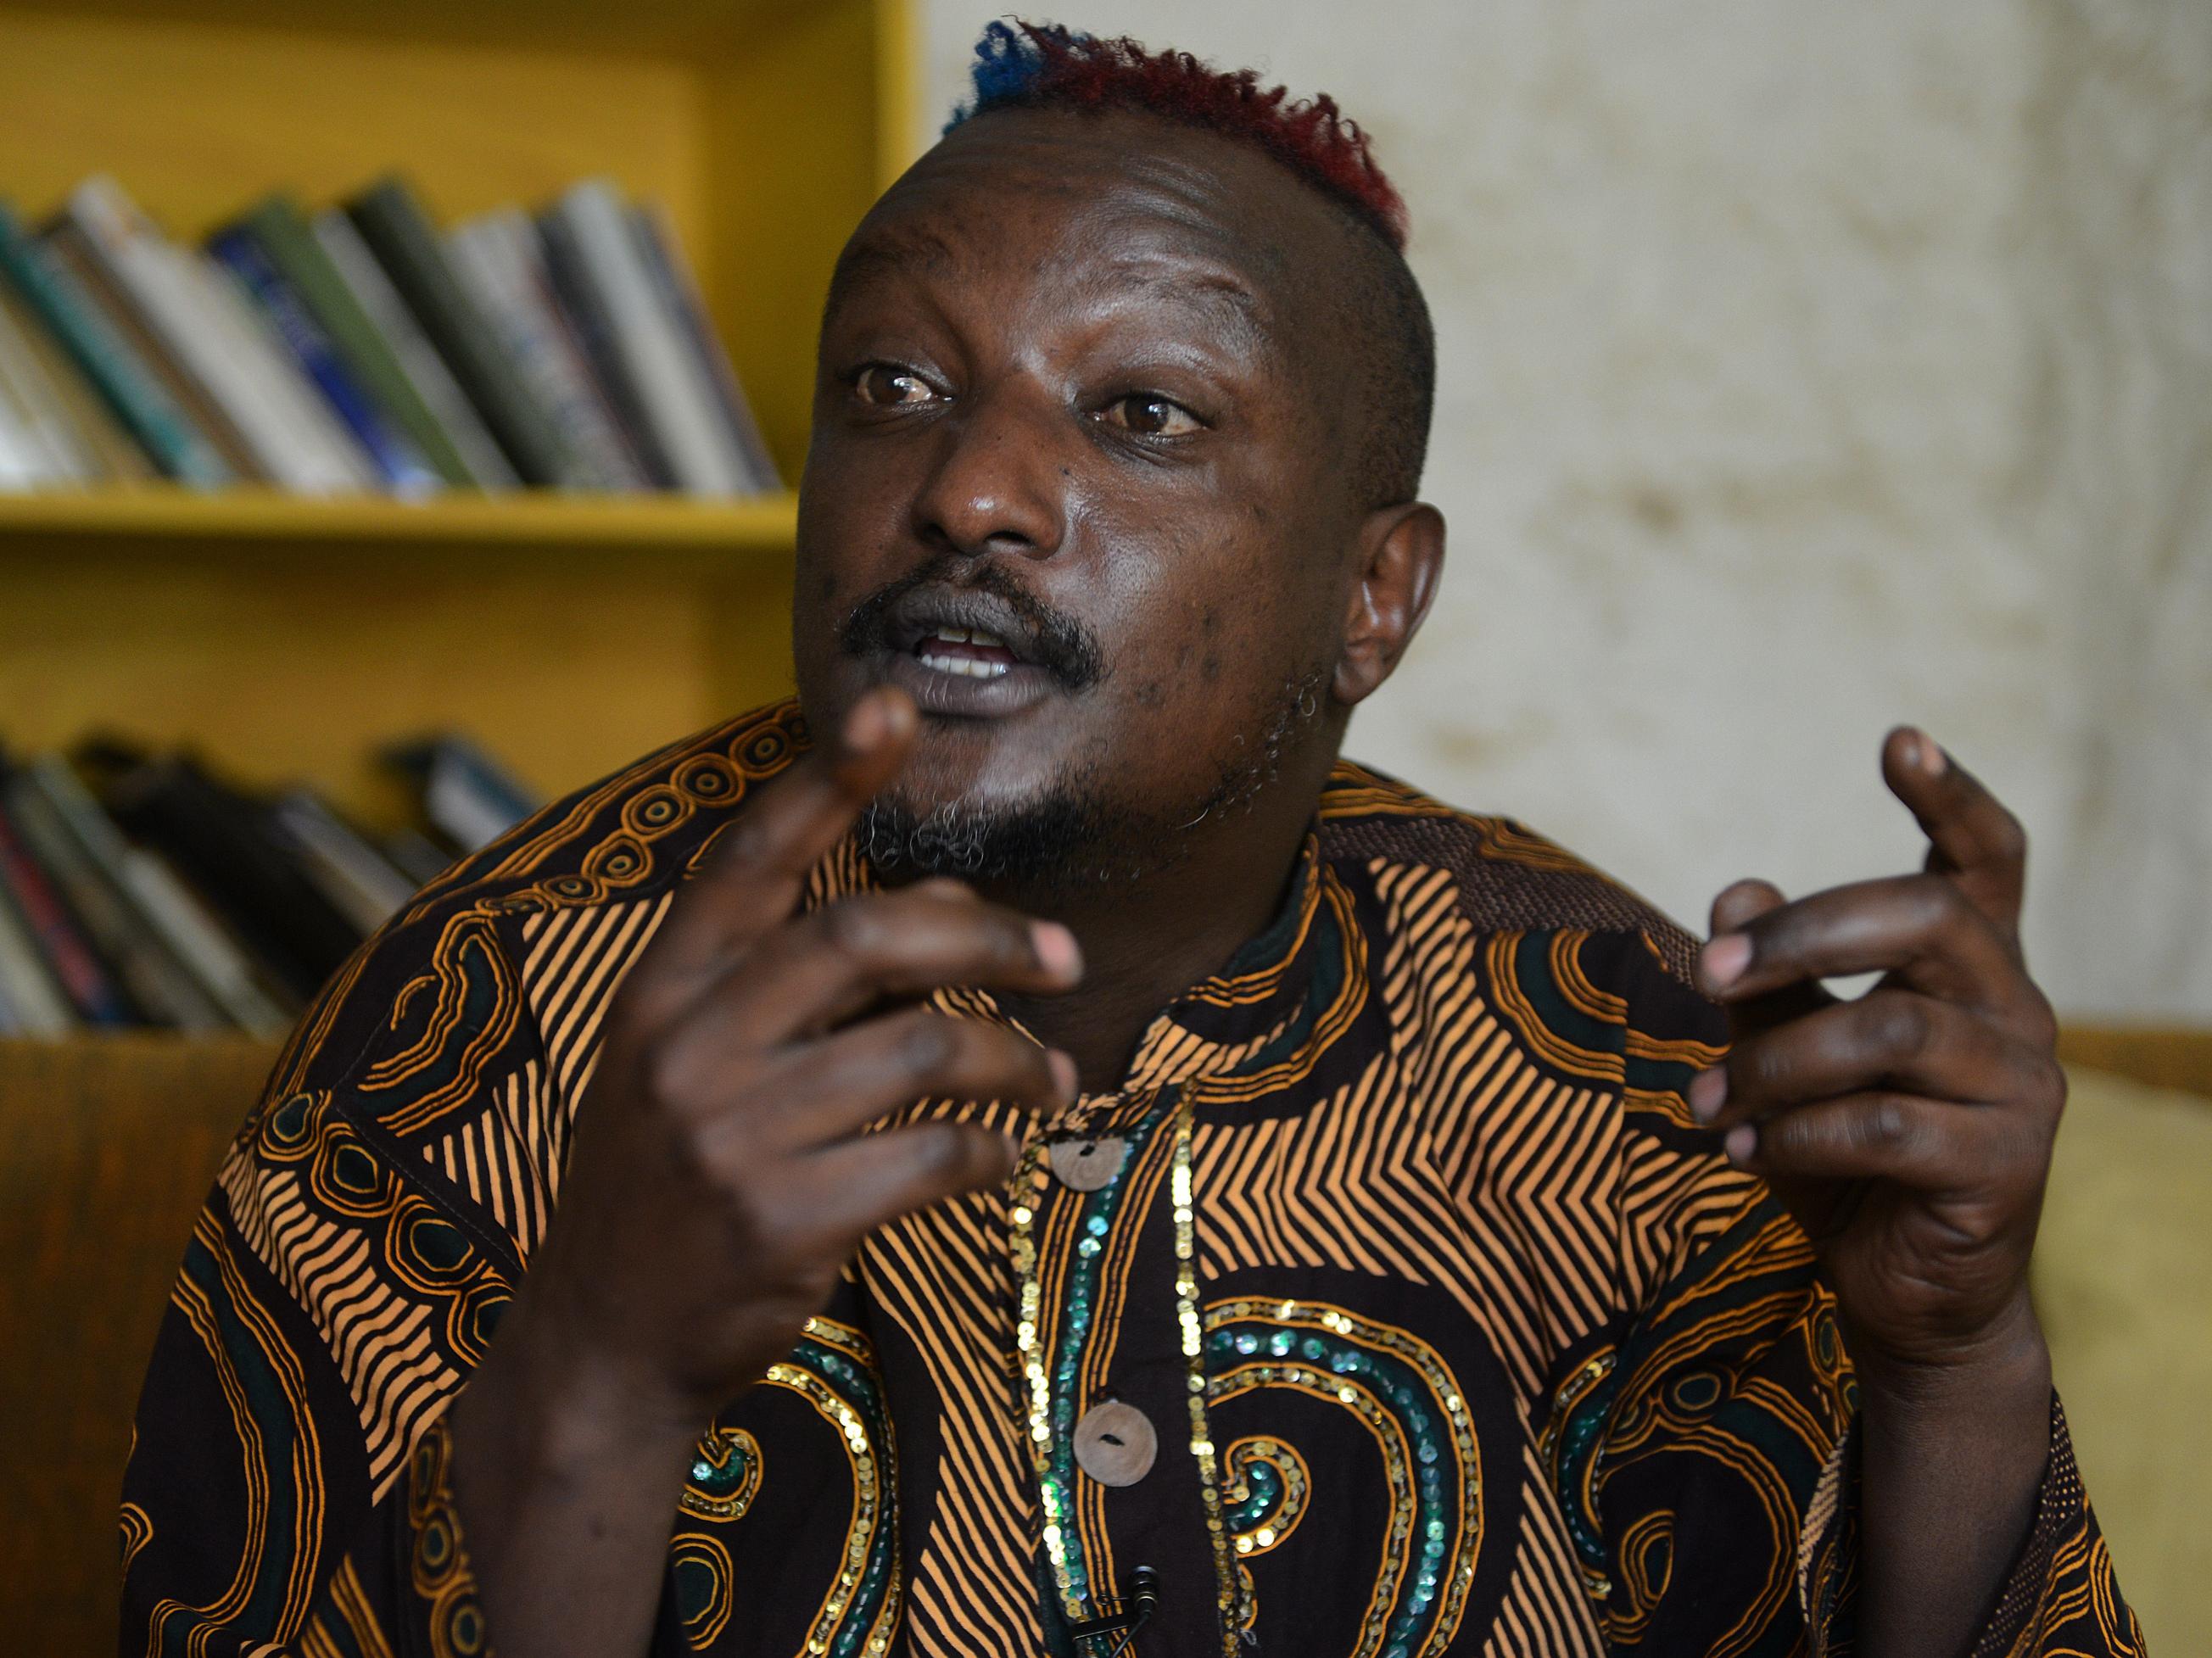 Binyavanga Wainaina Tells Us 'How To Write About Africa'